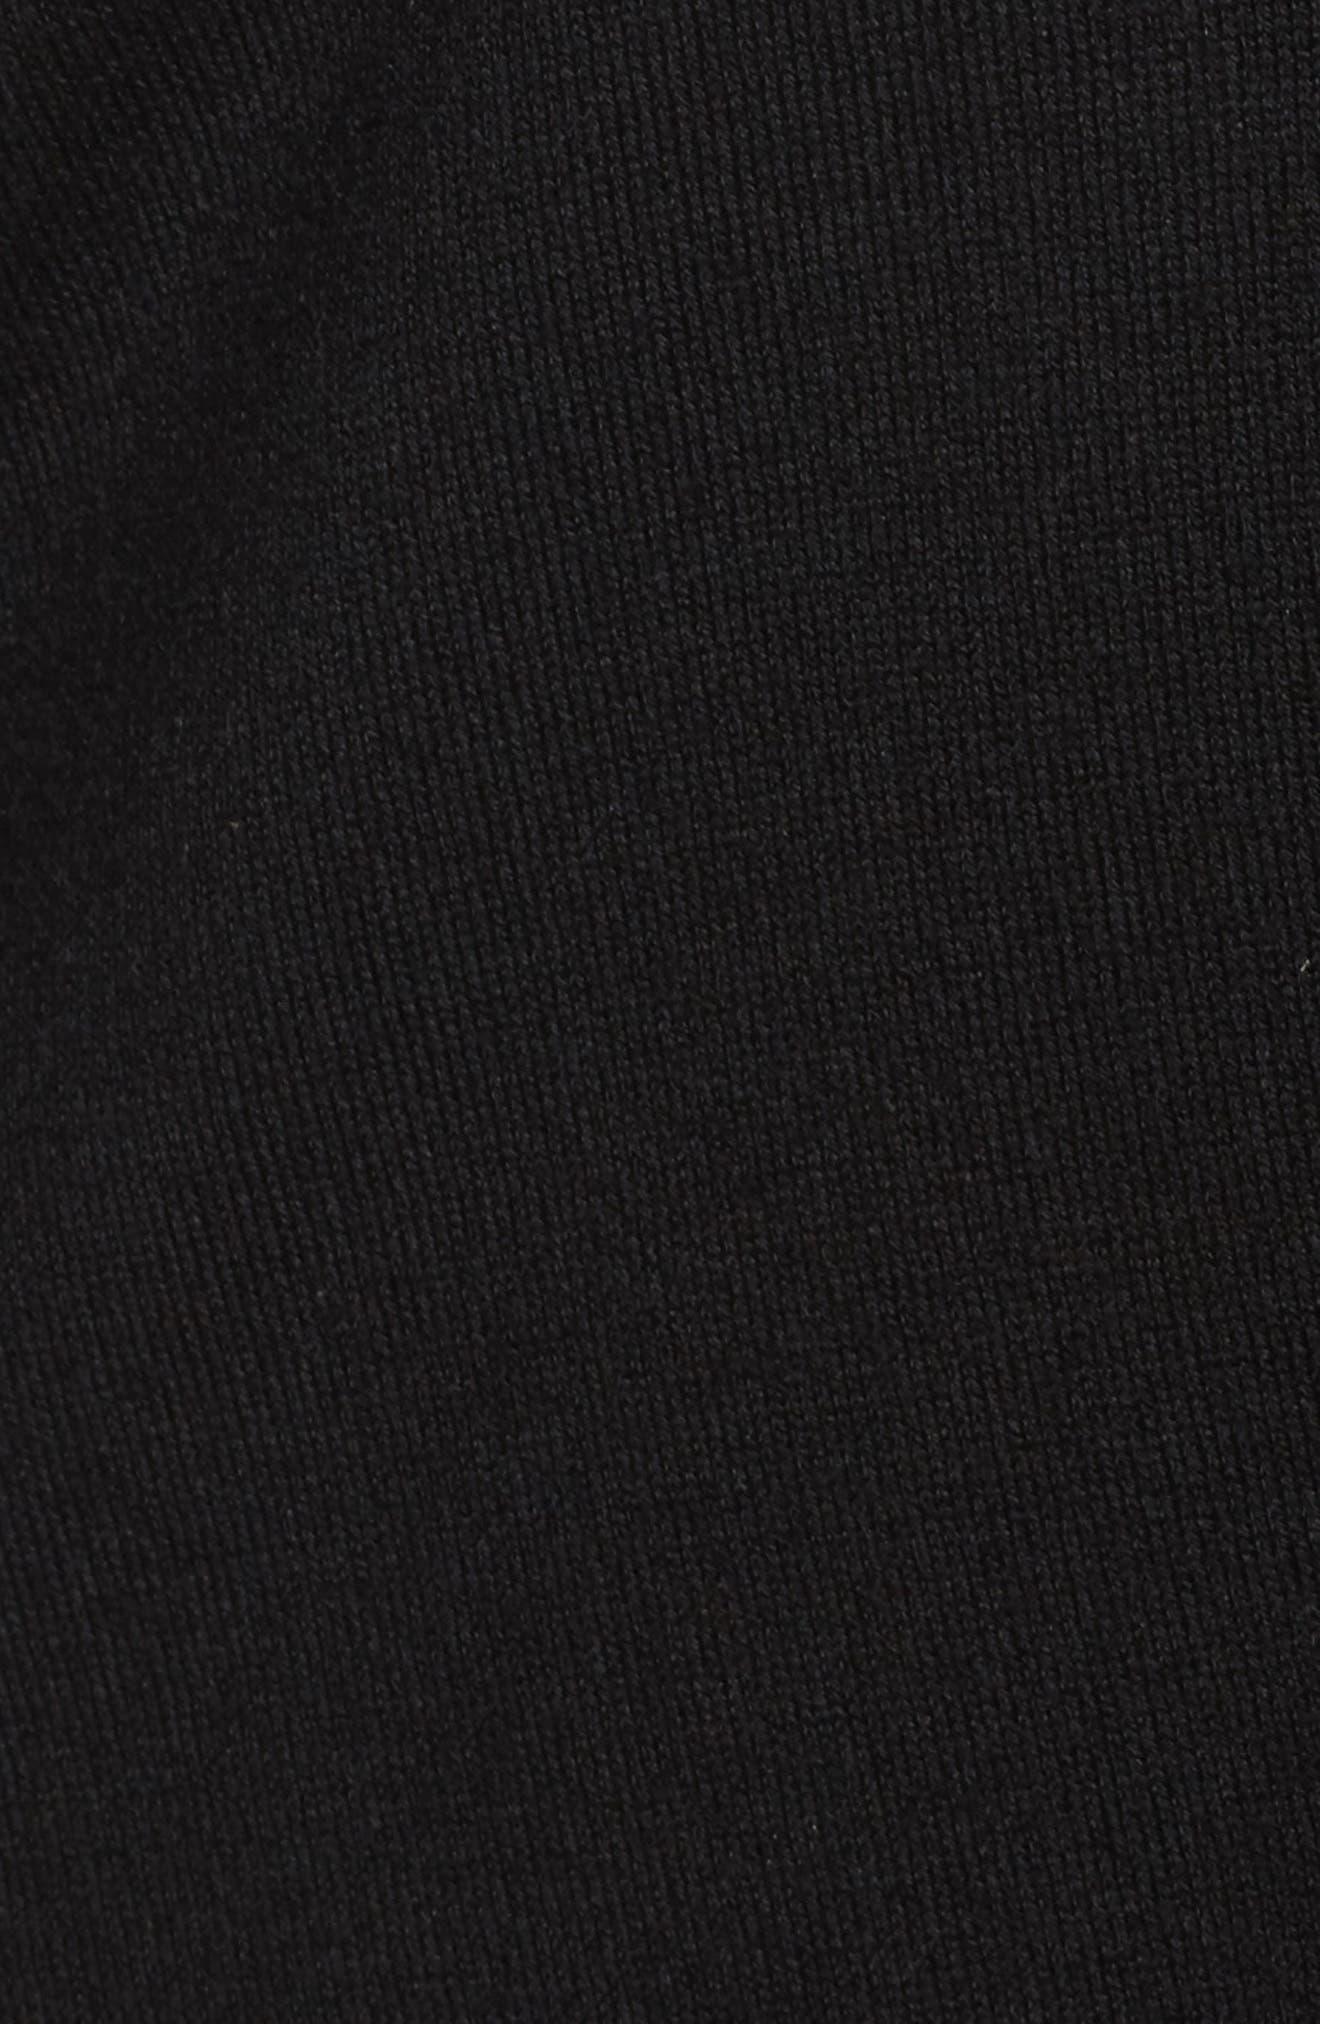 V-Neck Wool Blend Cardigan,                             Alternate thumbnail 5, color,                             Black